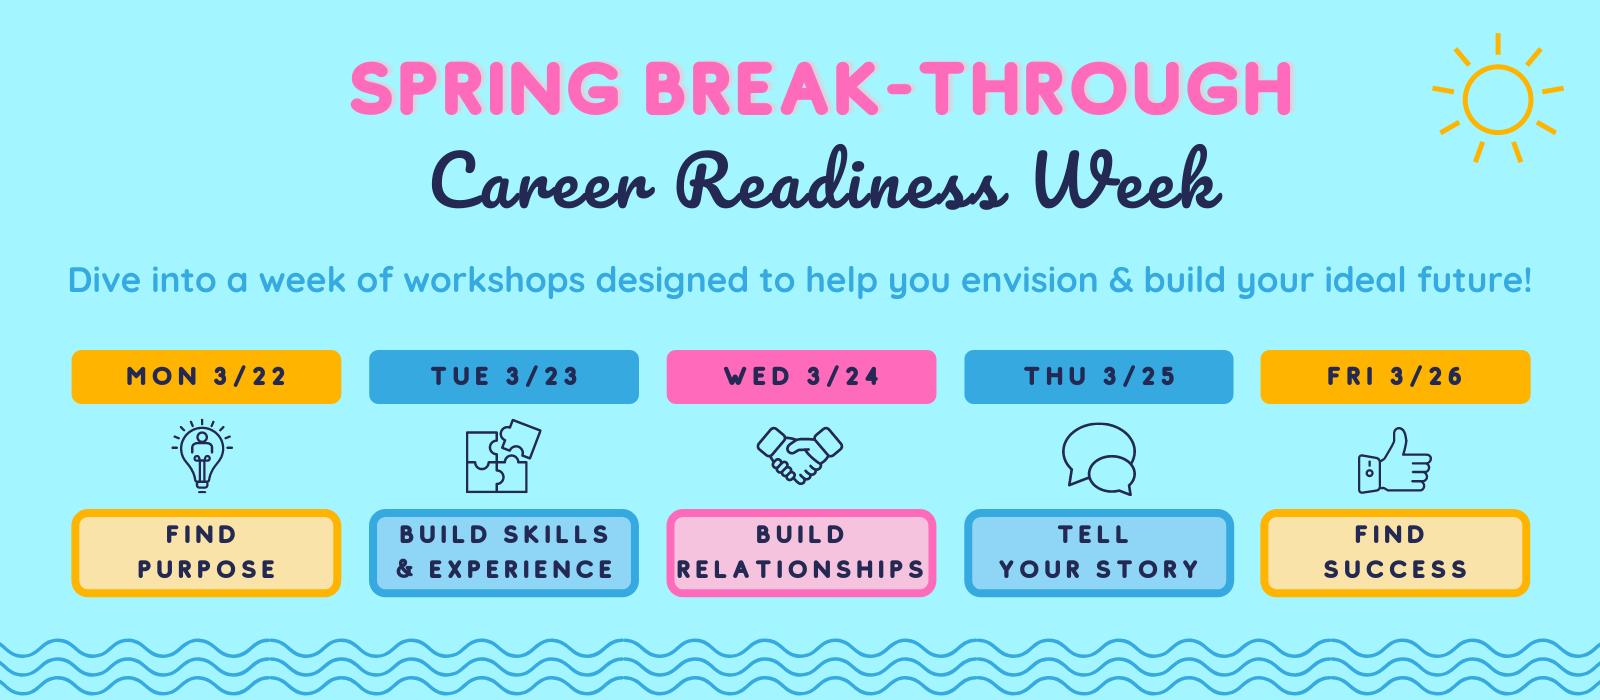 Spring Break-Through: Career Readiness Week daily topics image